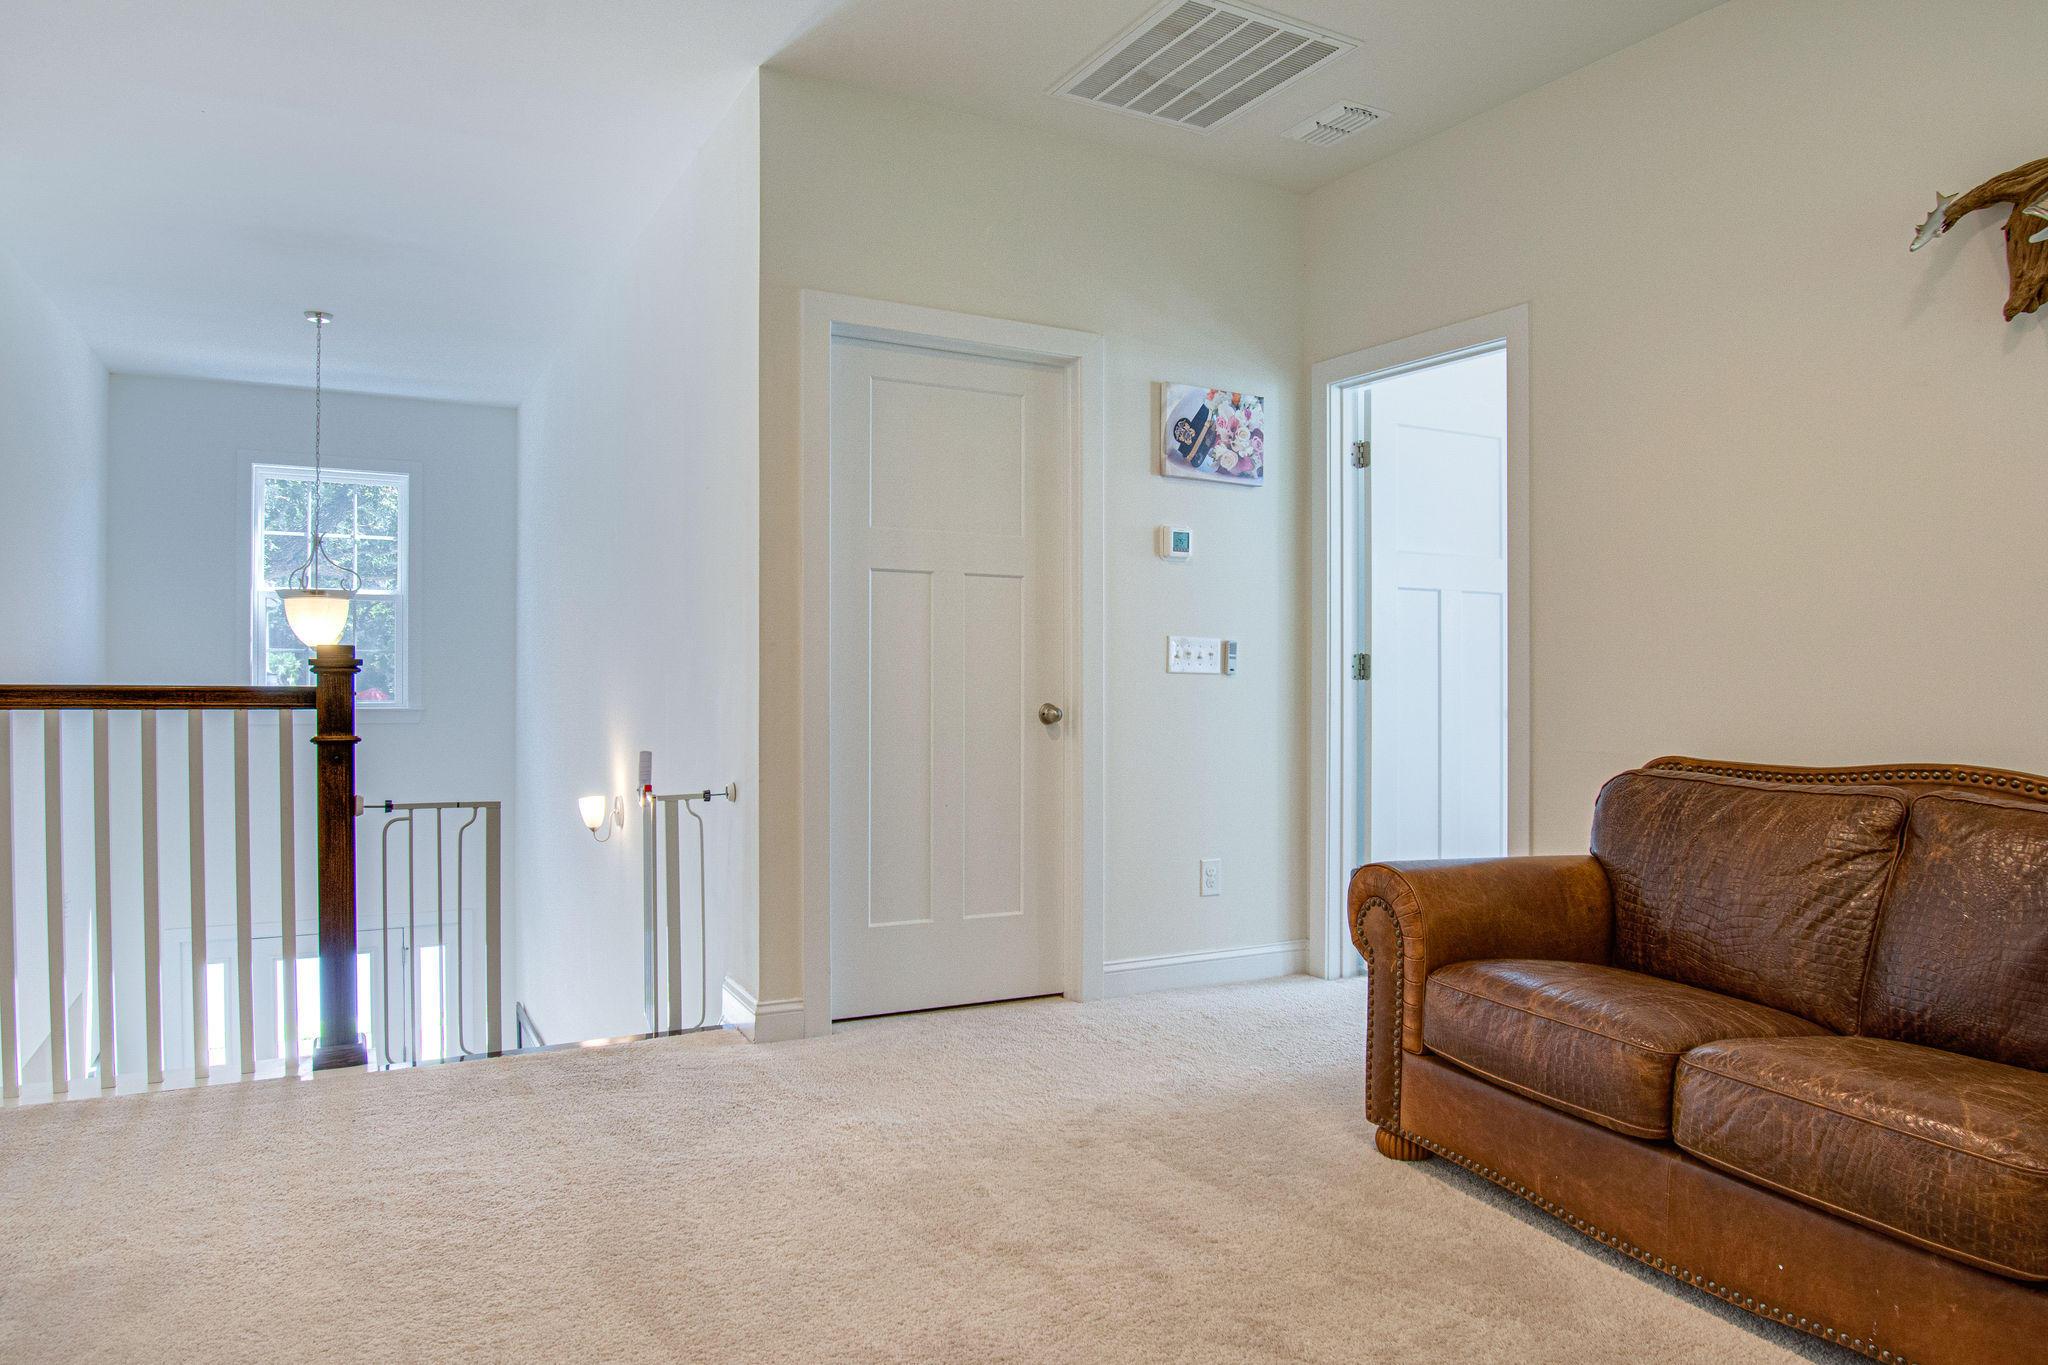 Magnolia Village Homes For Sale - 1261 Pearwood, Mount Pleasant, SC - 13